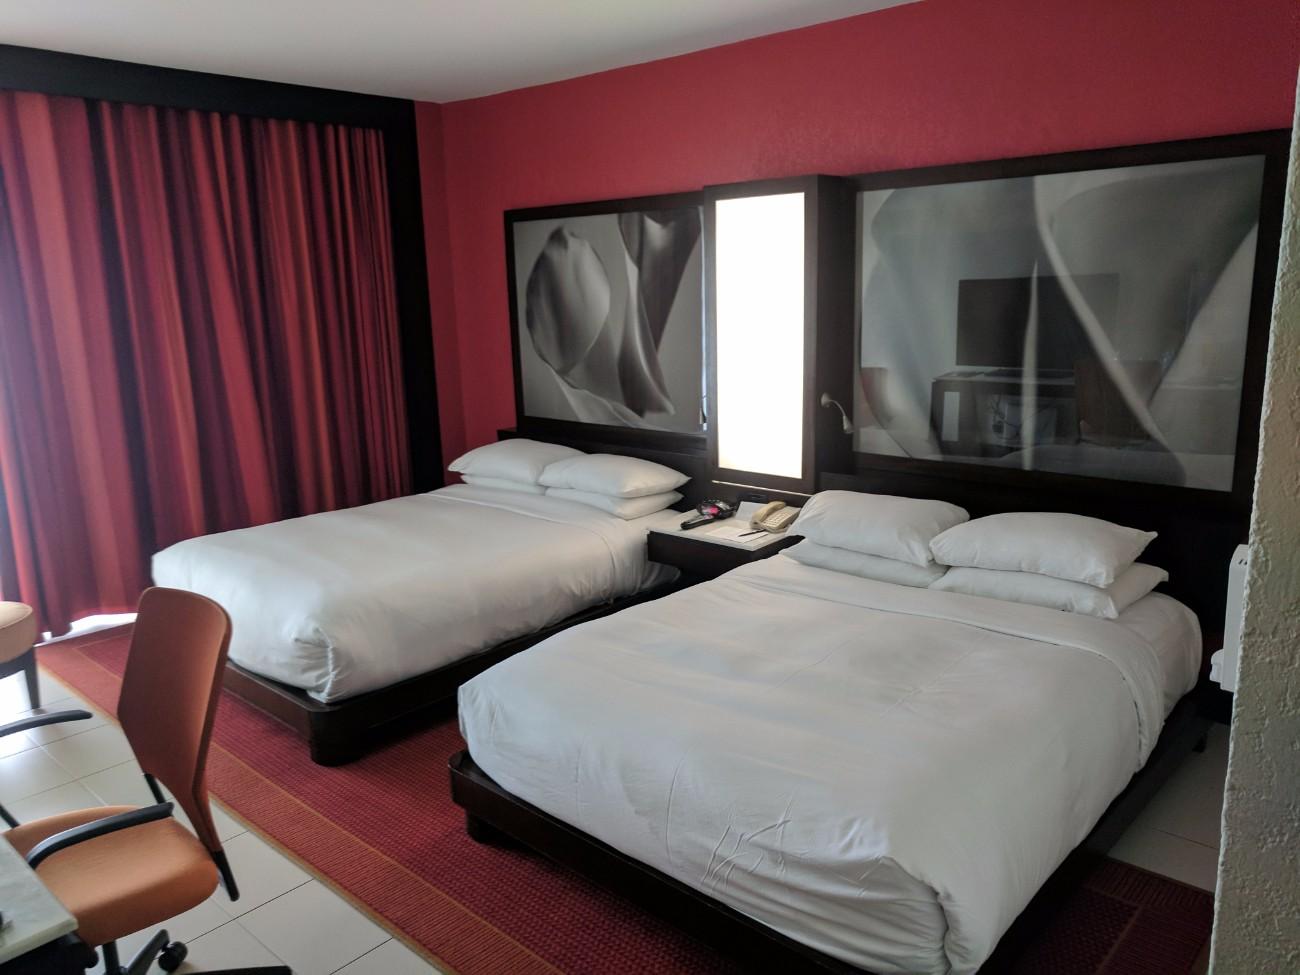 Queen room at Condado Plaza Hilton San Juan Puerto Rico